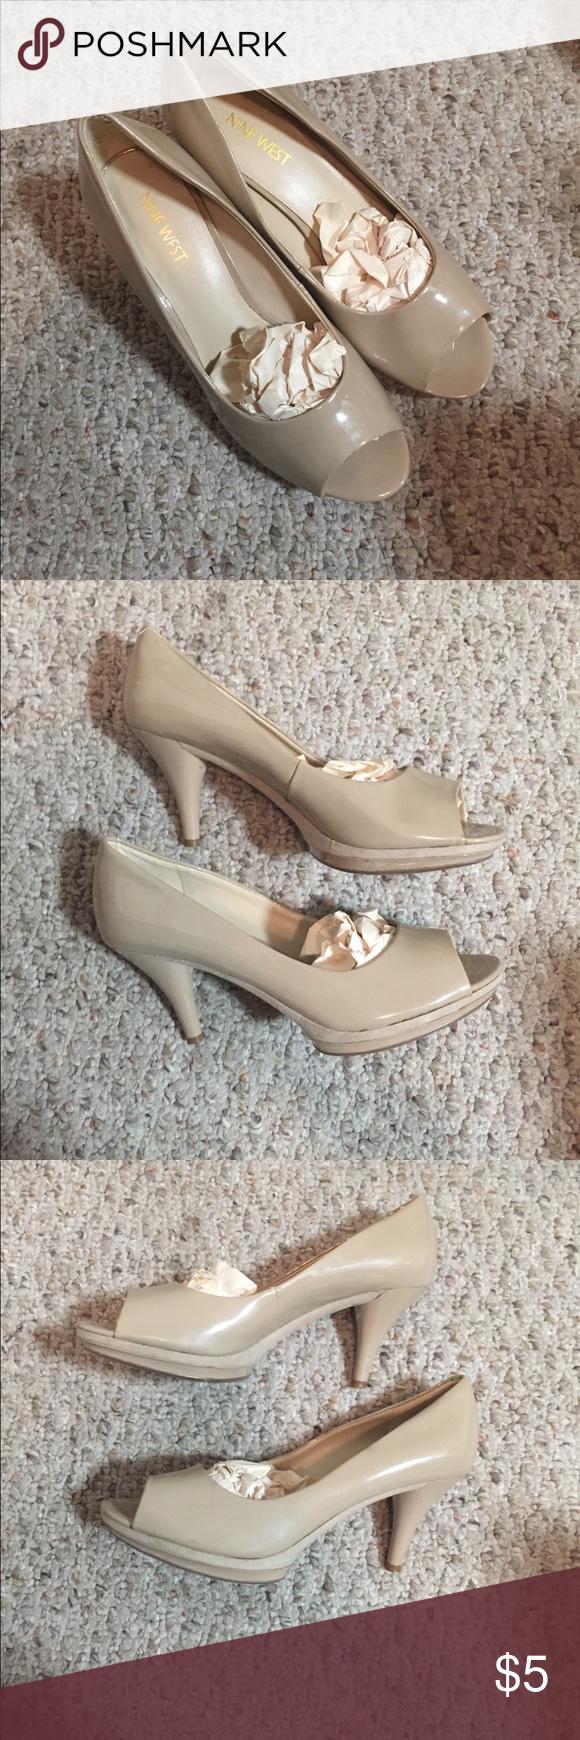 mejor servicio 51ef6 dc518 Nine West Open toe nude heels staple for every closet! very ...